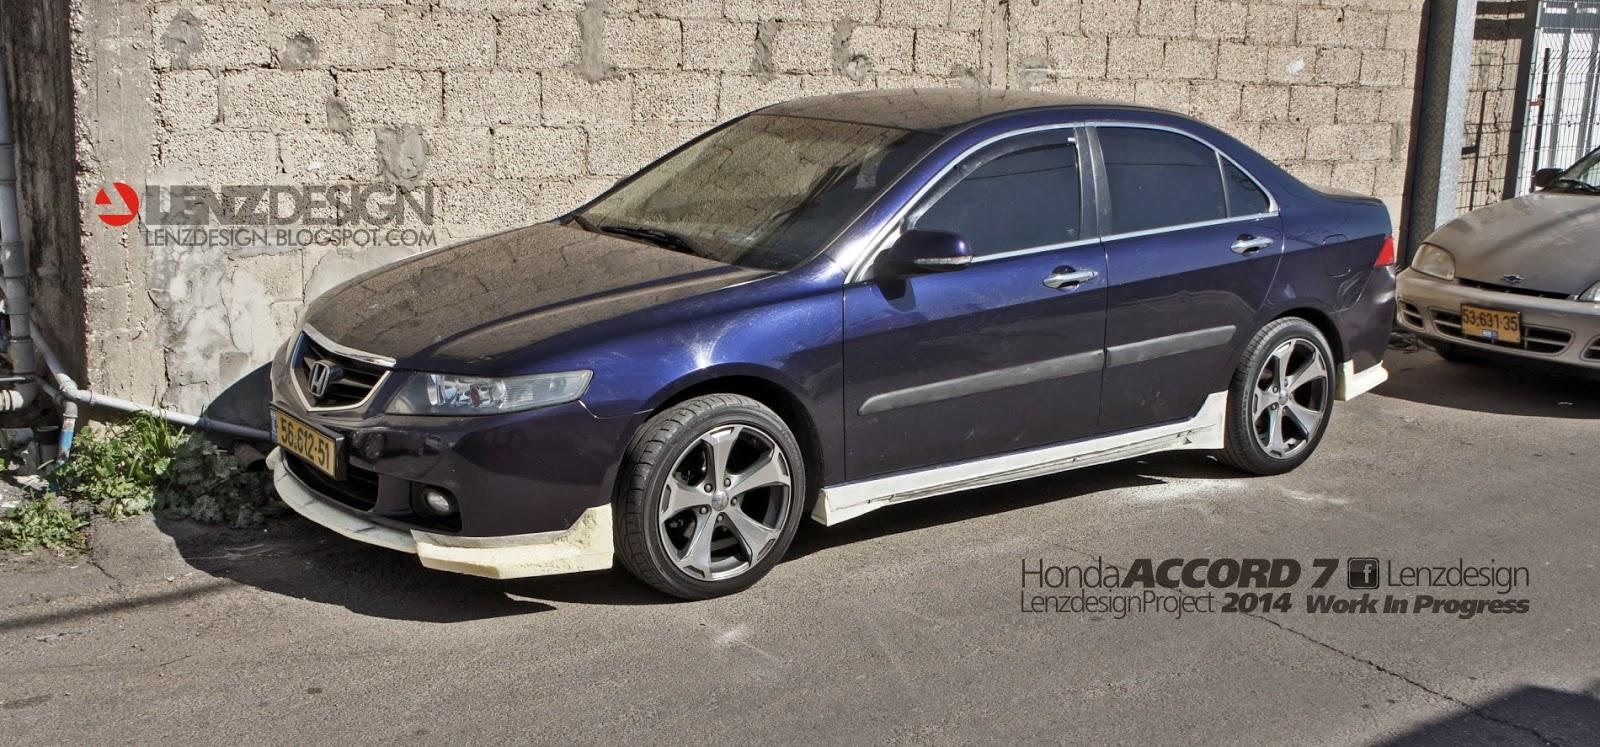 New Honda Accord >> Honda Accord 7 Tuning Lenzdesign Performance